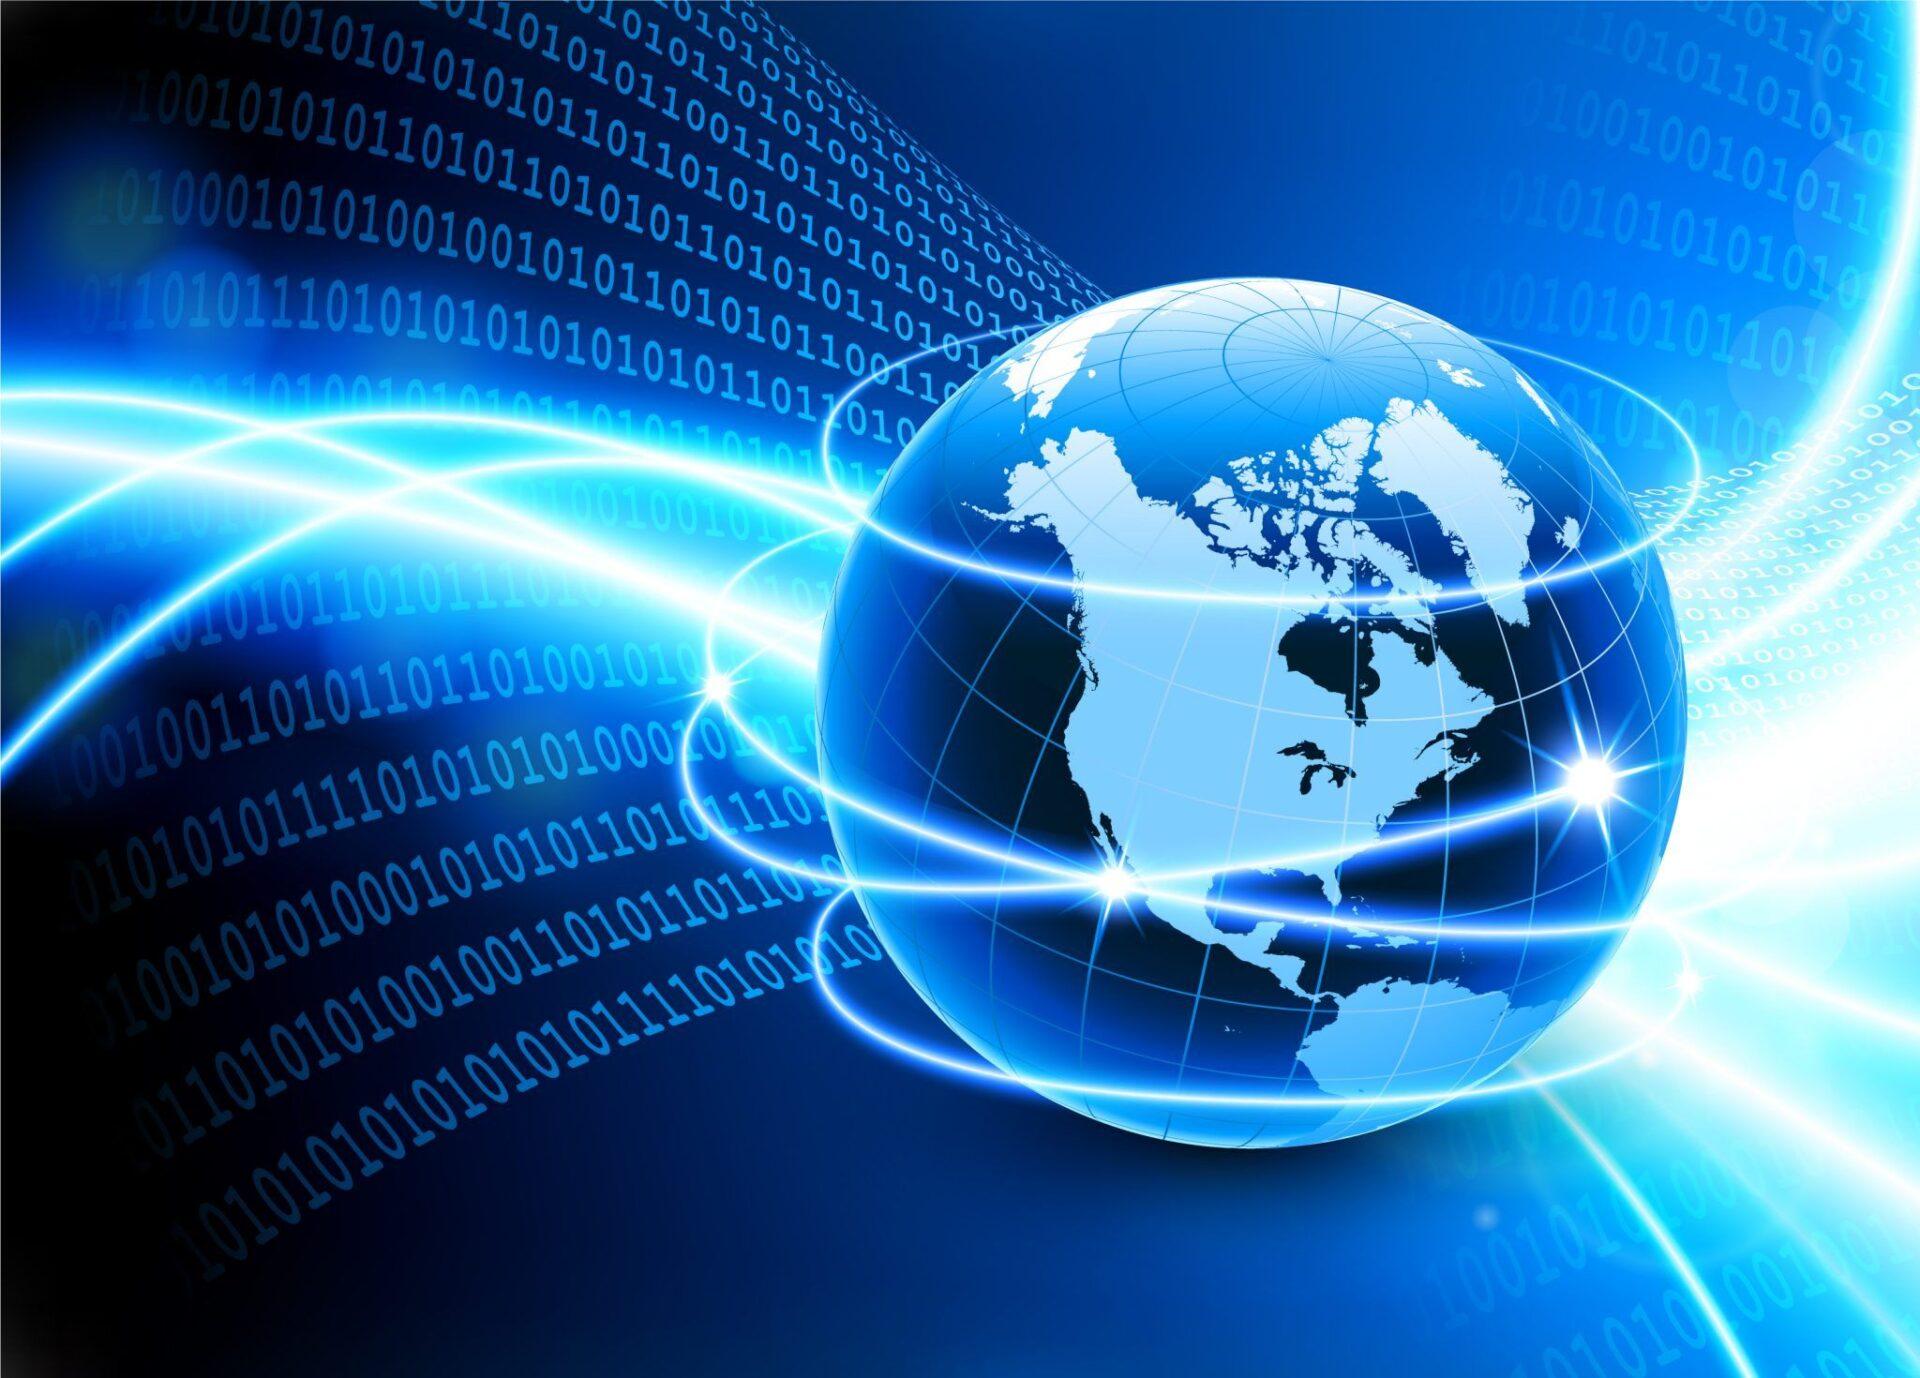 Cybersecurity: Nigeria participates in Asia Pacific cyber drills